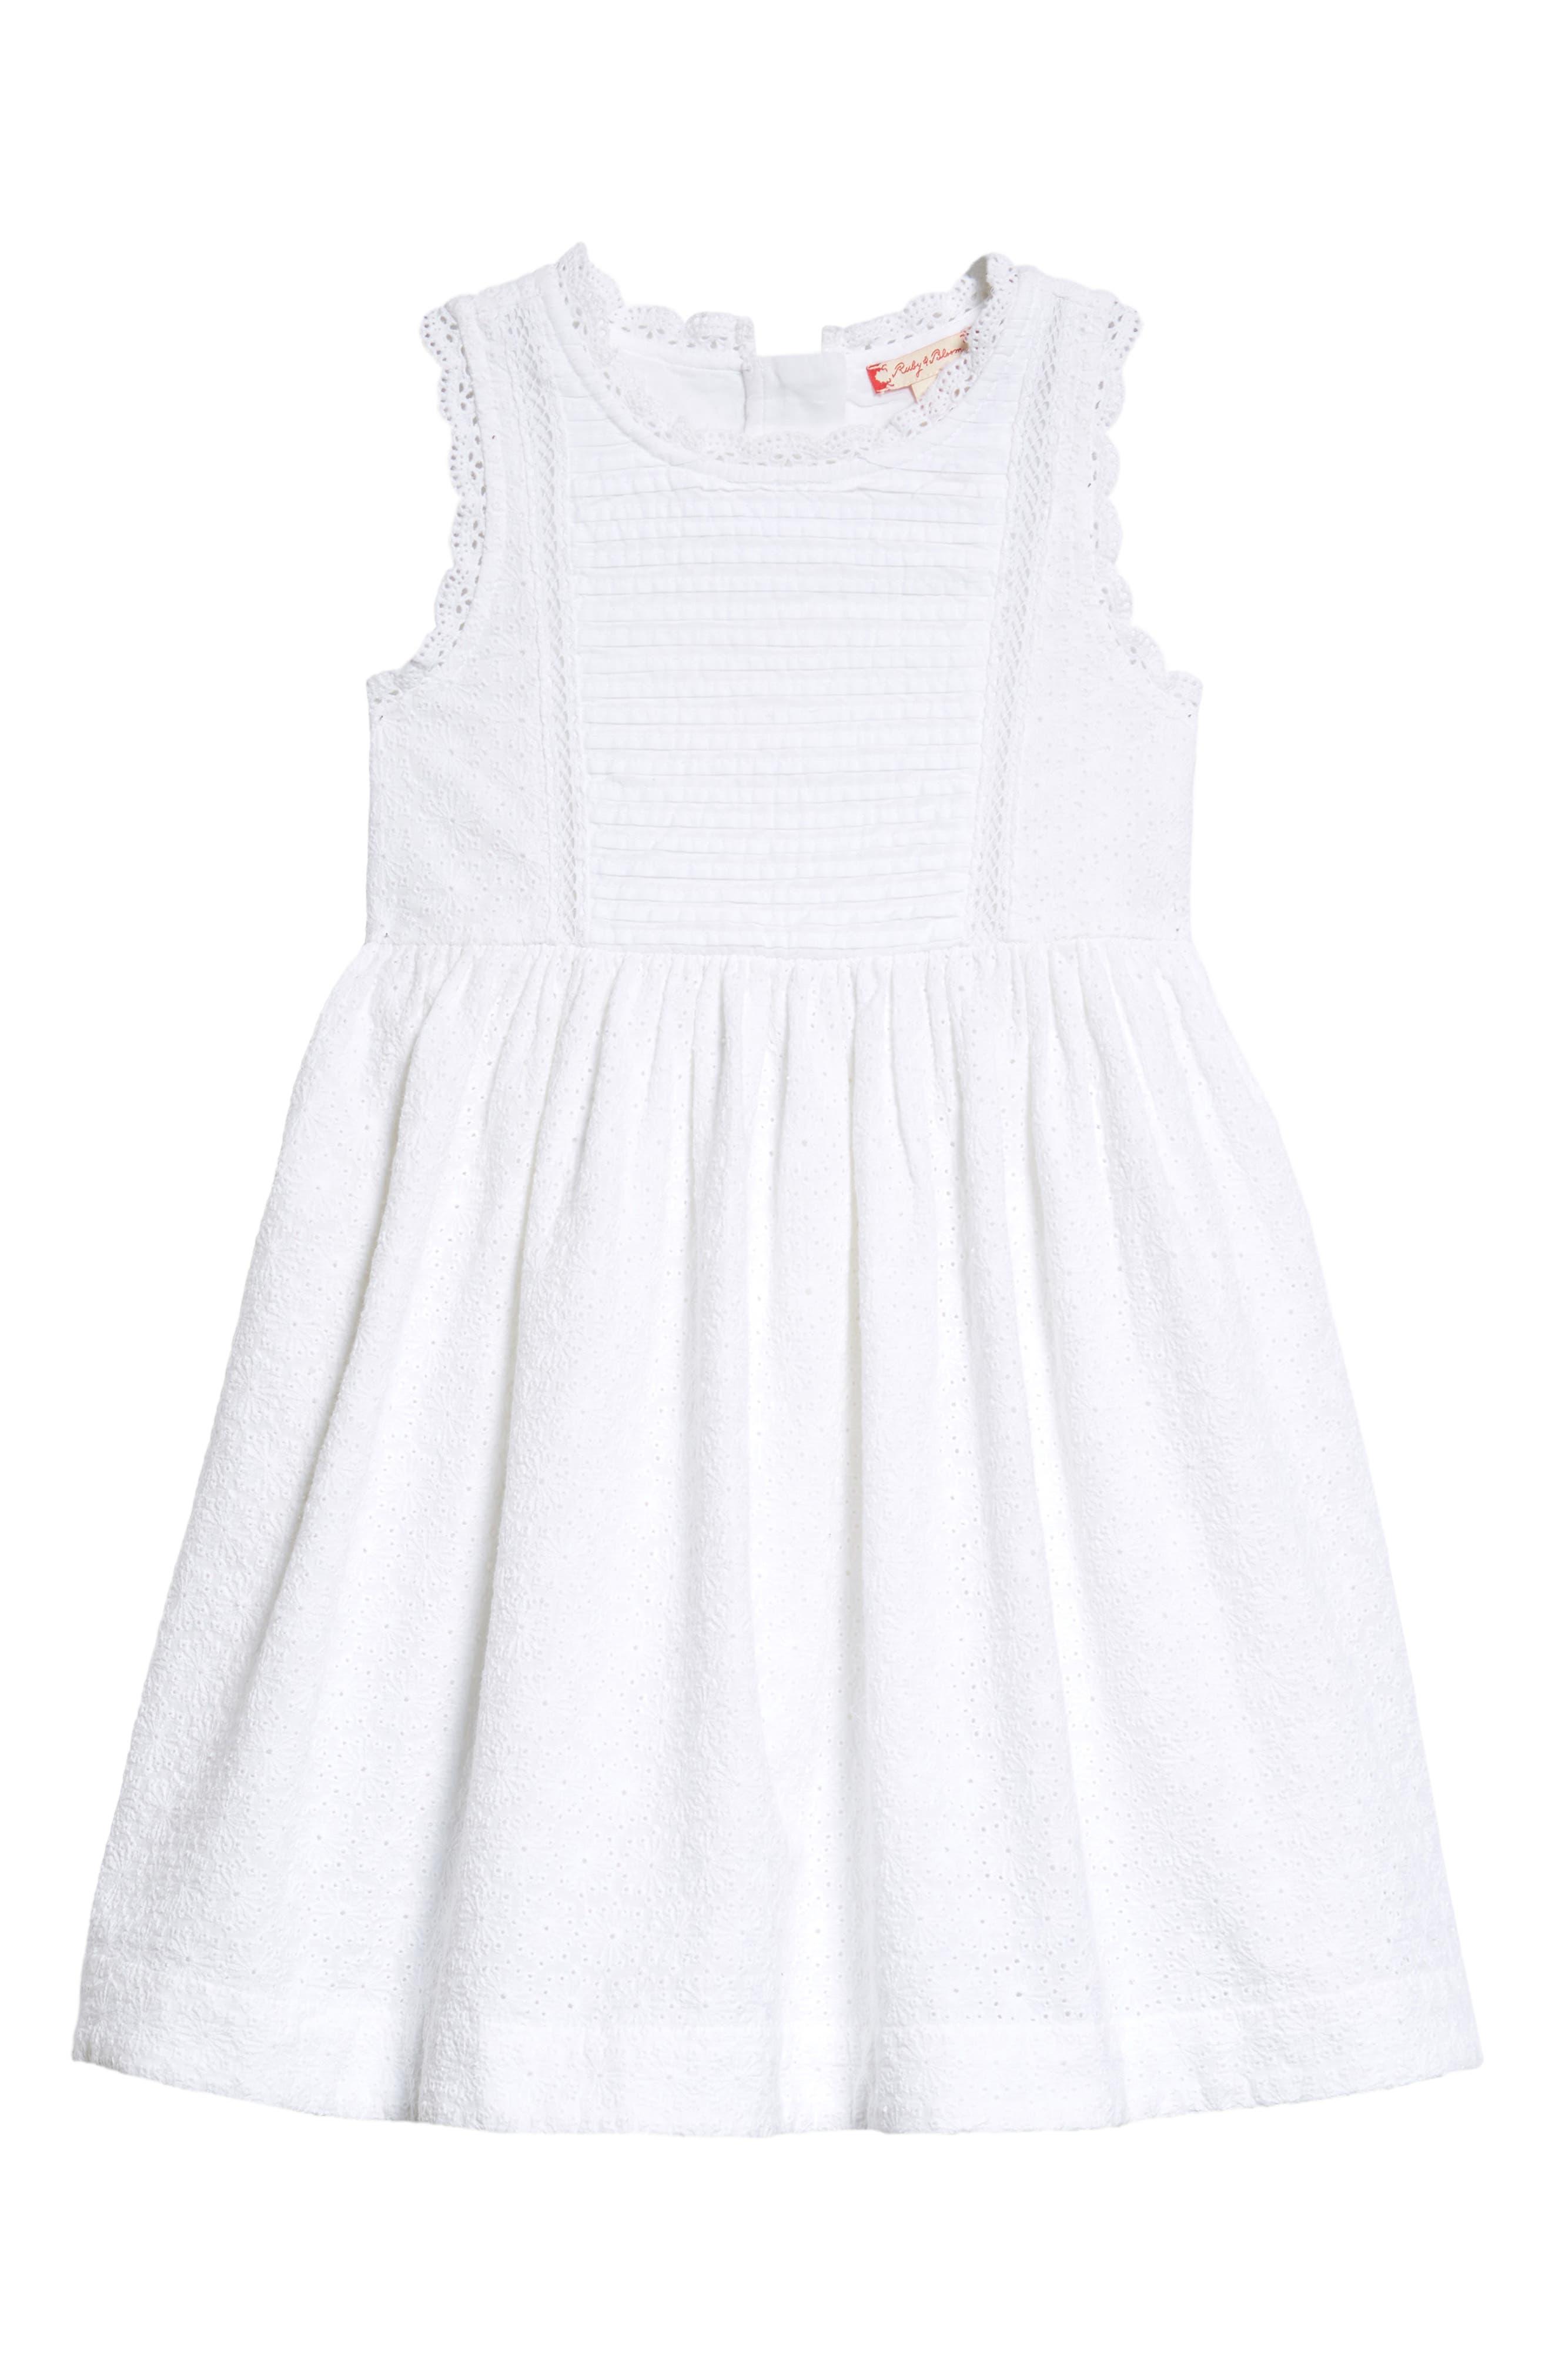 Lace Shift Dress,                             Main thumbnail 1, color,                             White